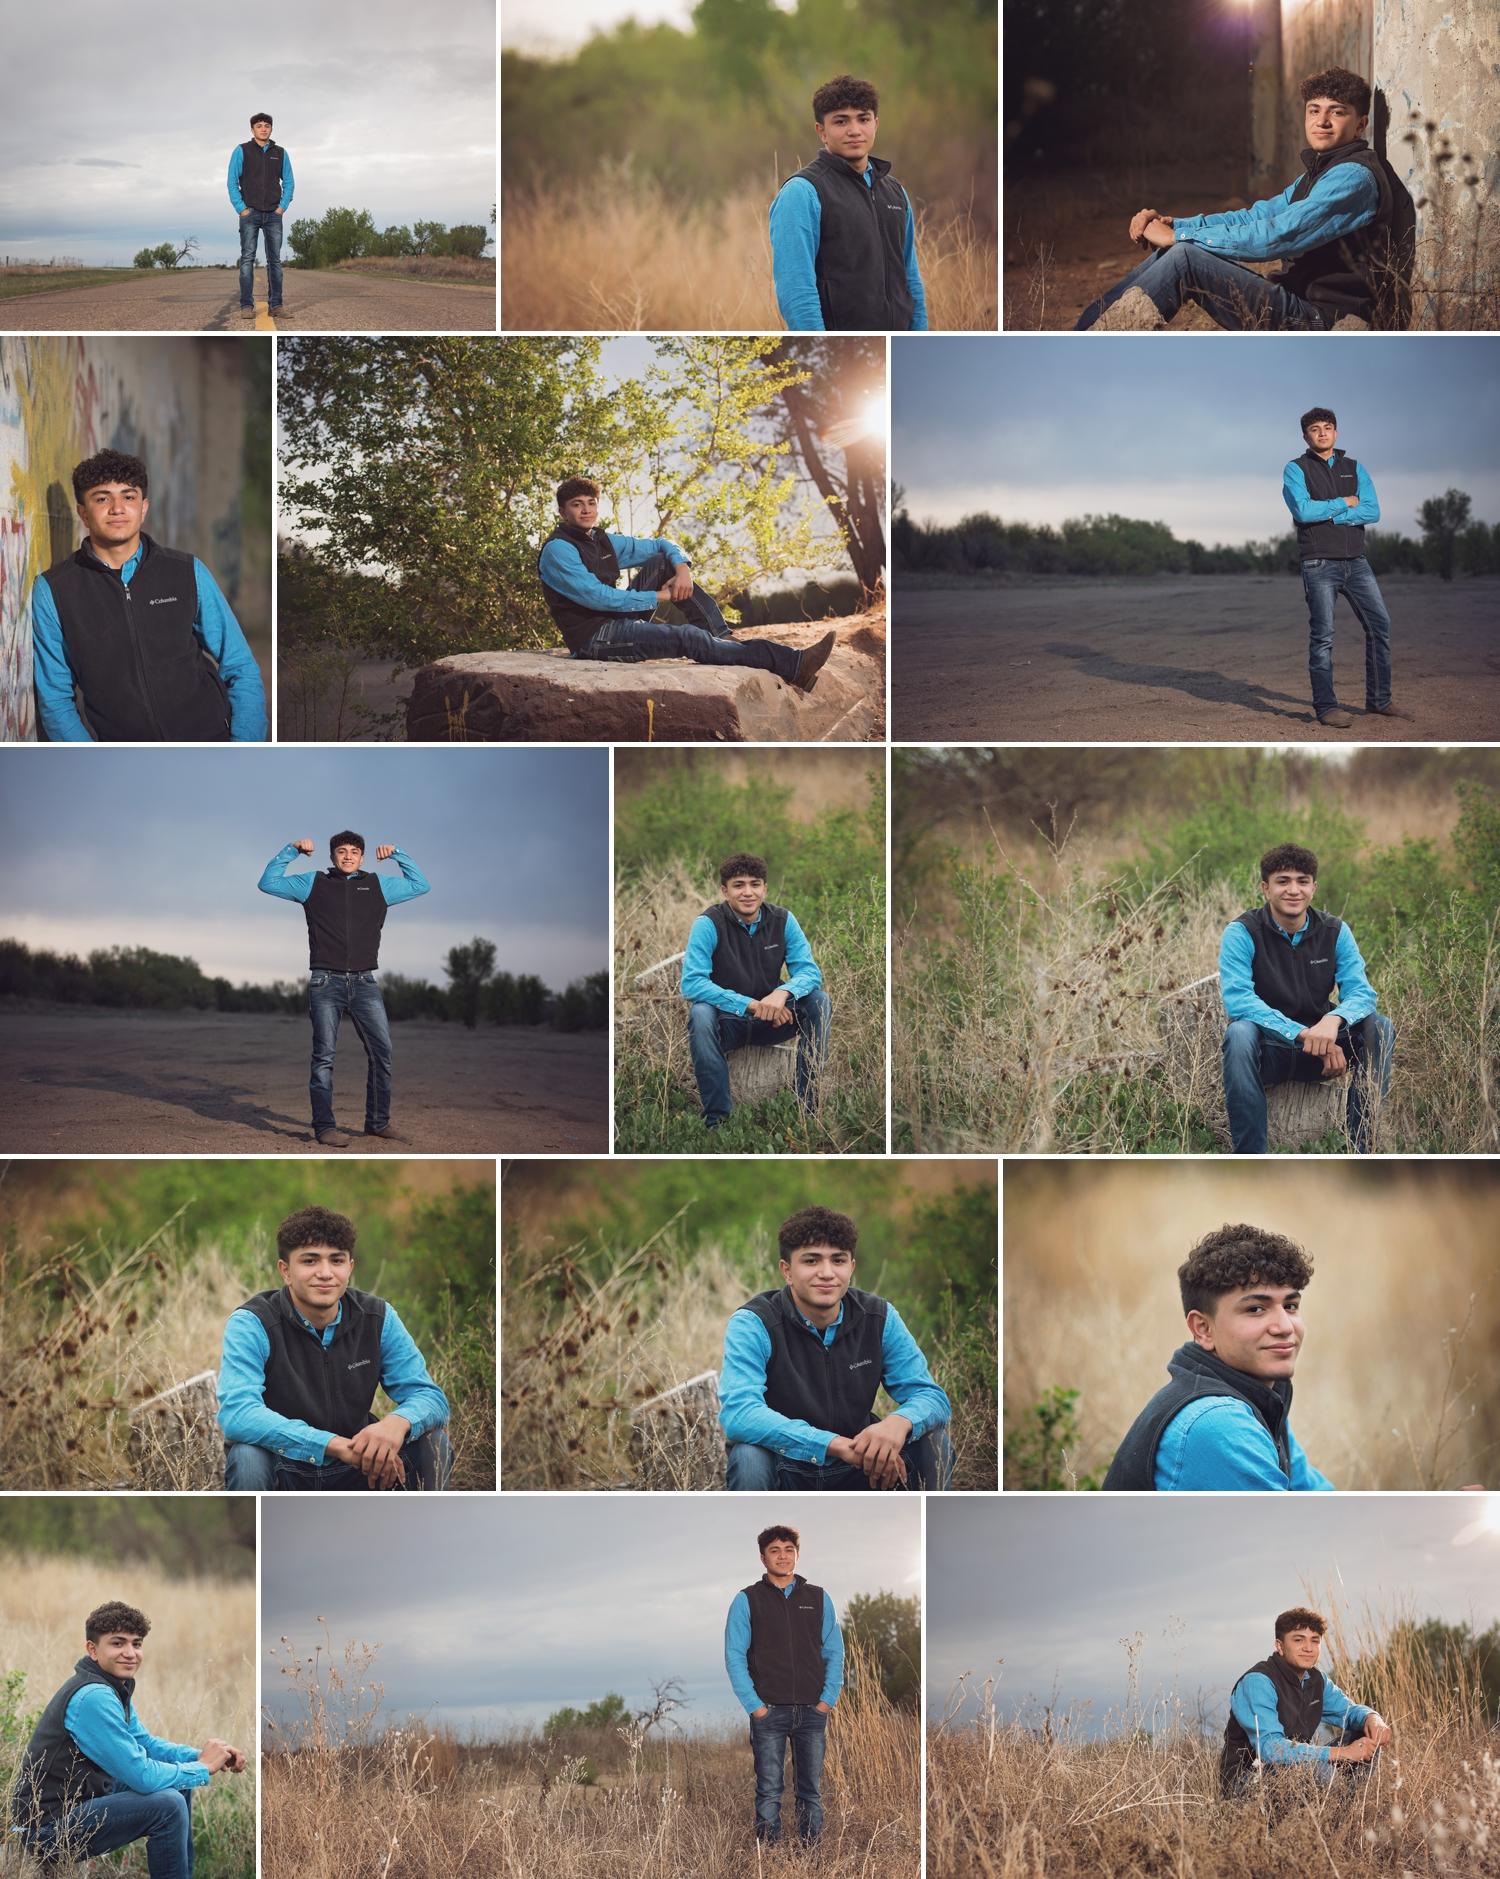 Southwest-kansas-senior-photography 2.jpg